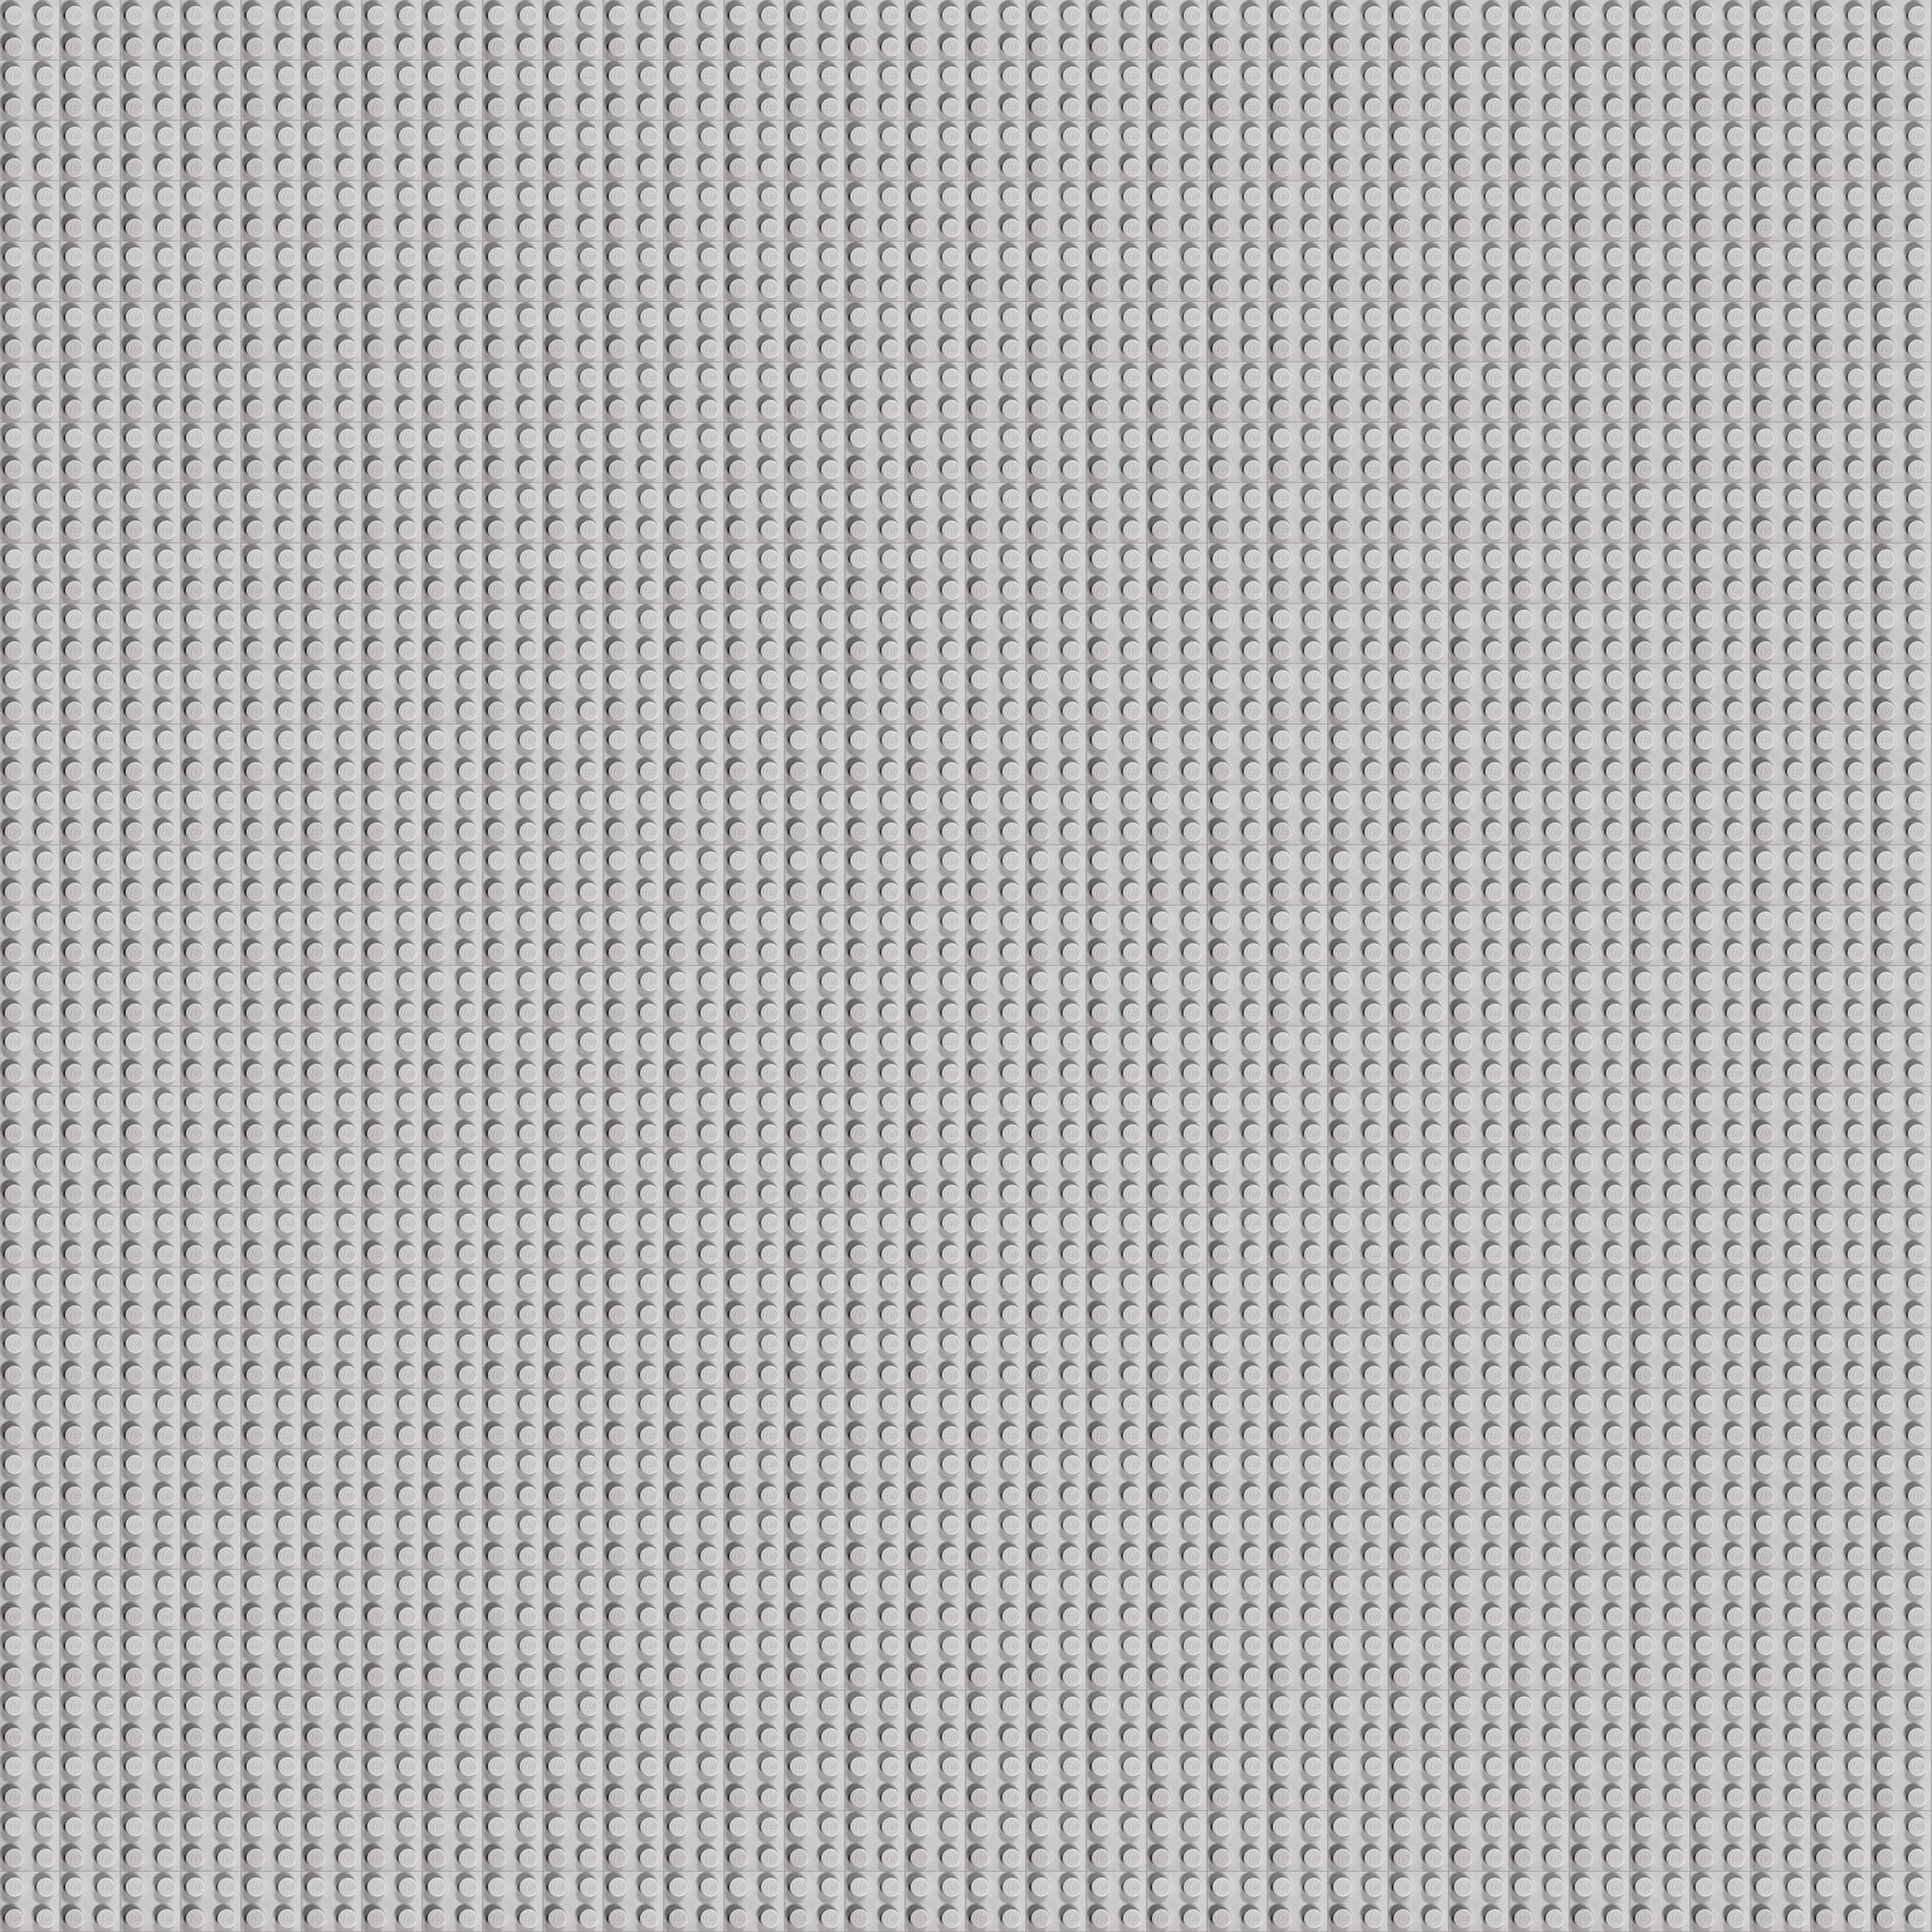 Wb37 Lego White Pattern Background Wallpaper